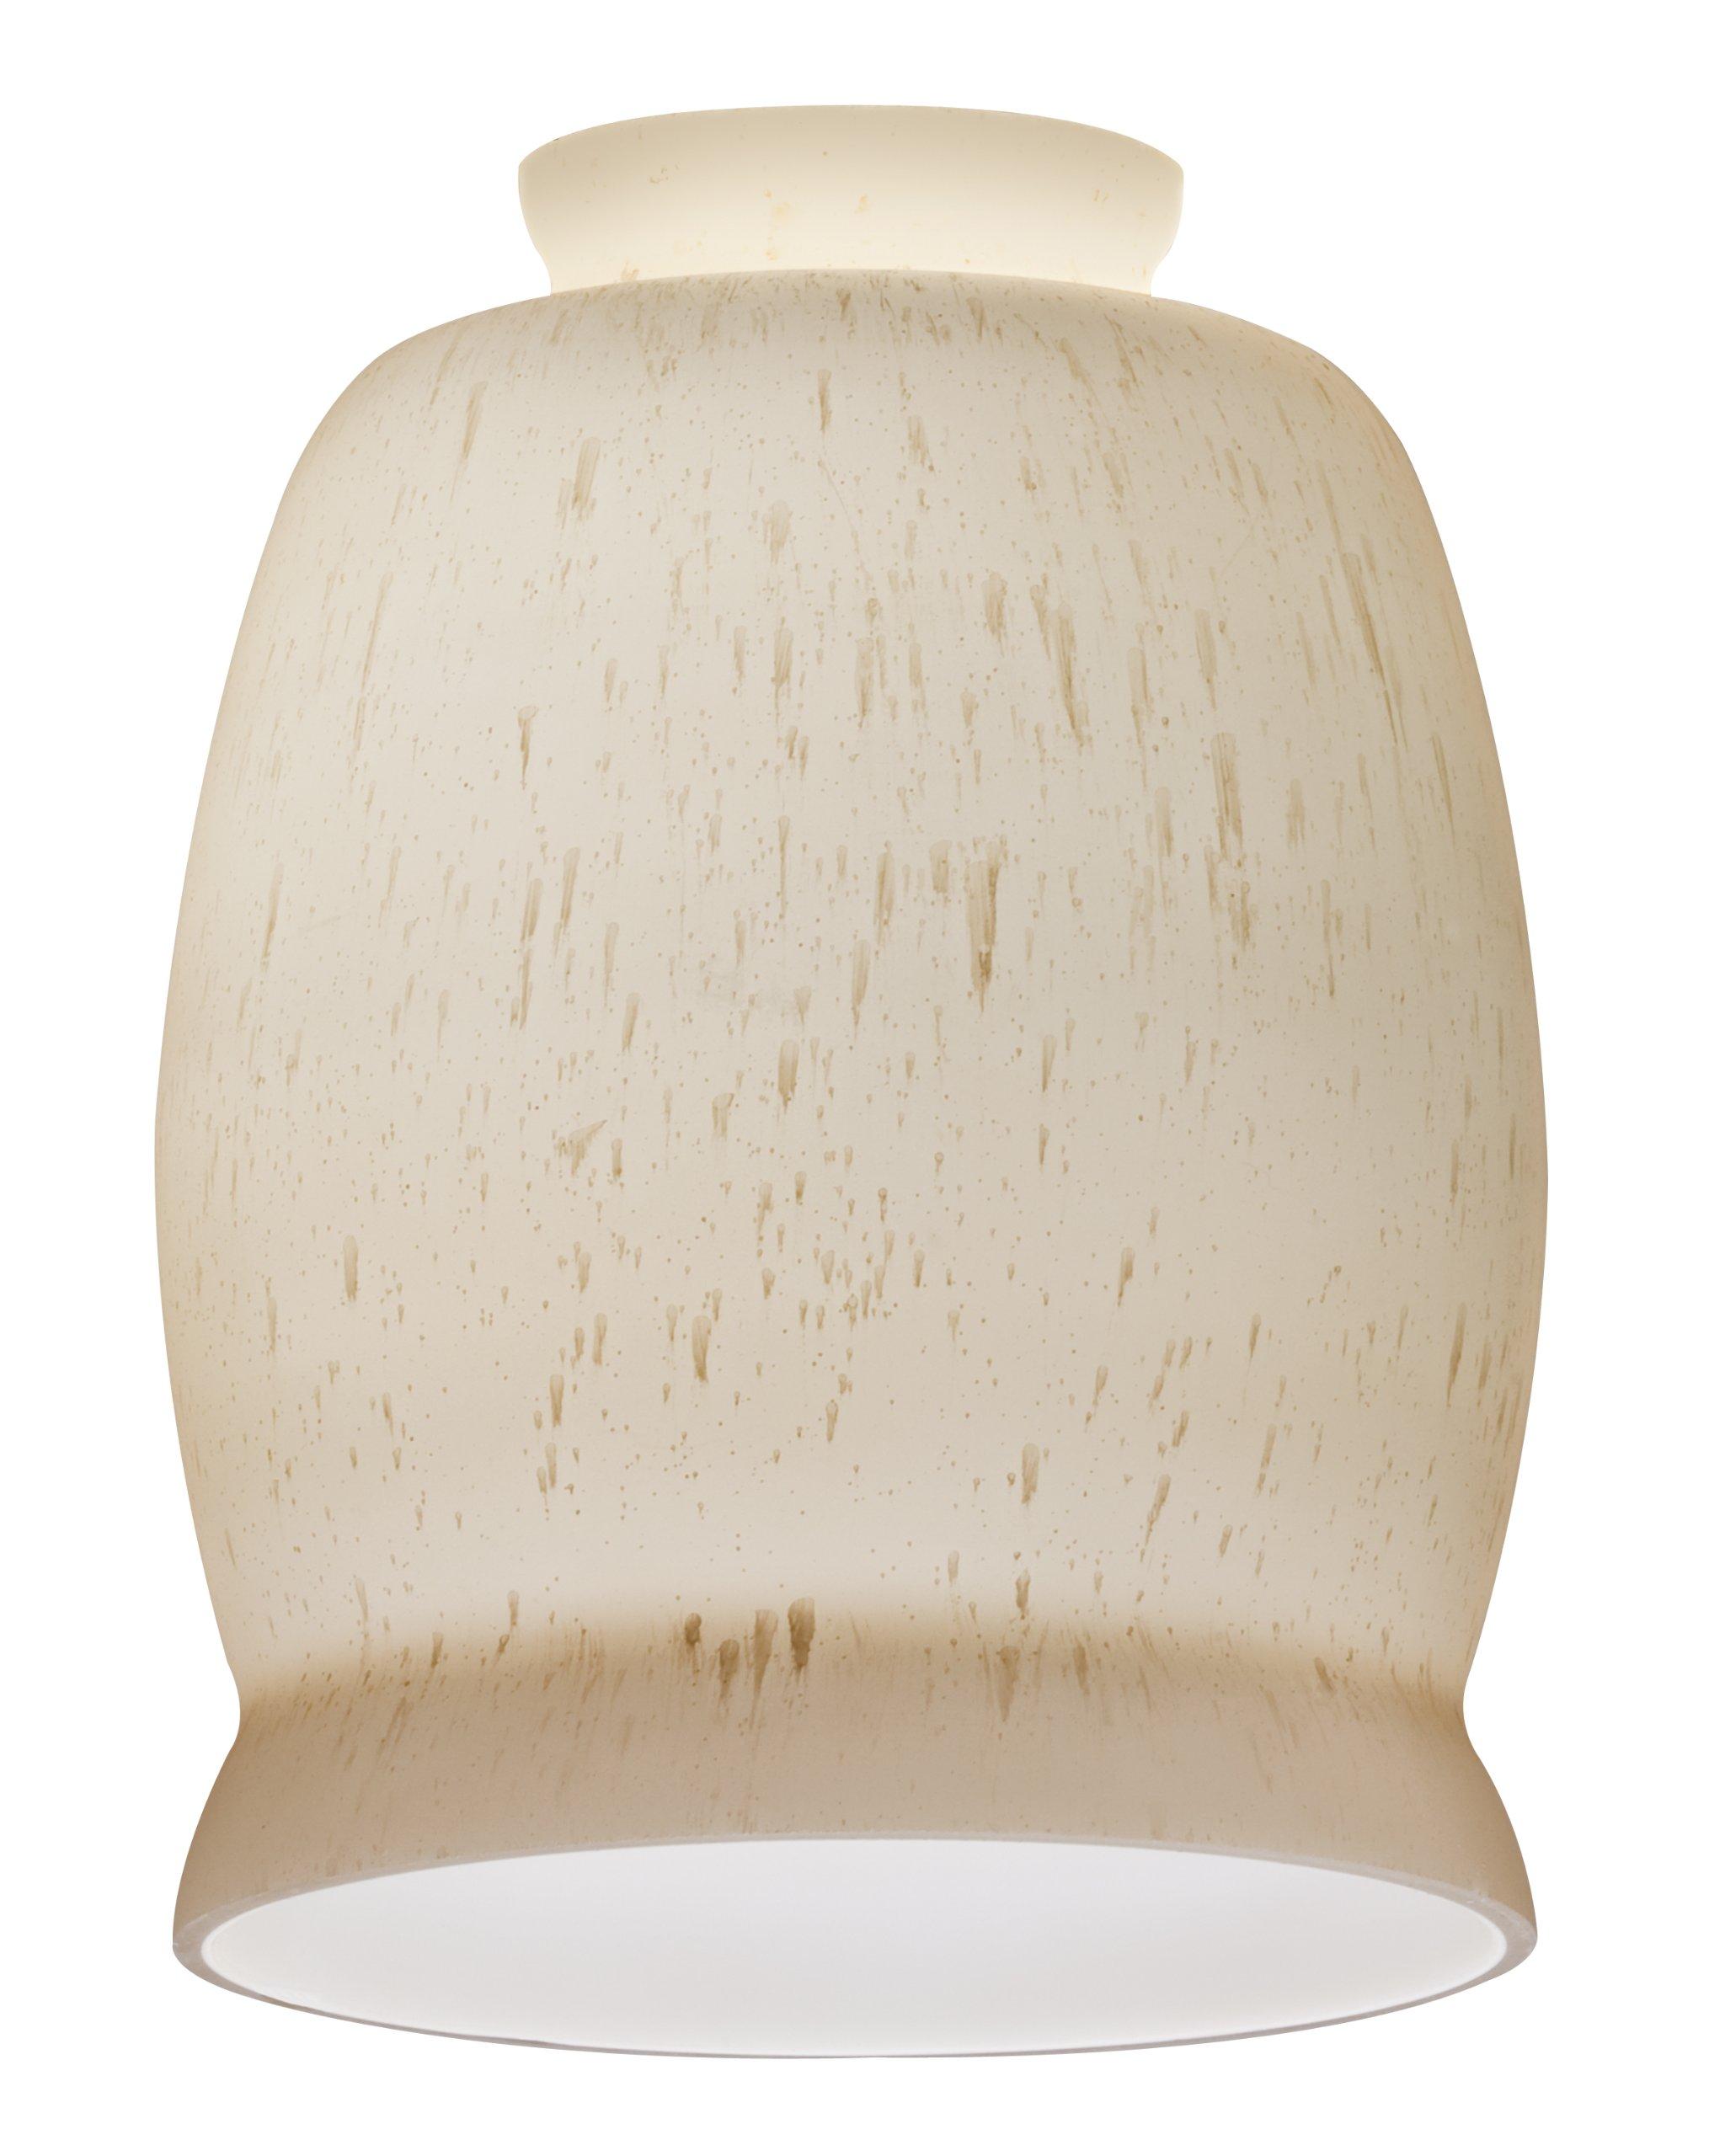 Lithonia Lighting DBIL 1015 M6 Decorative Bill Shade, Rain Drop